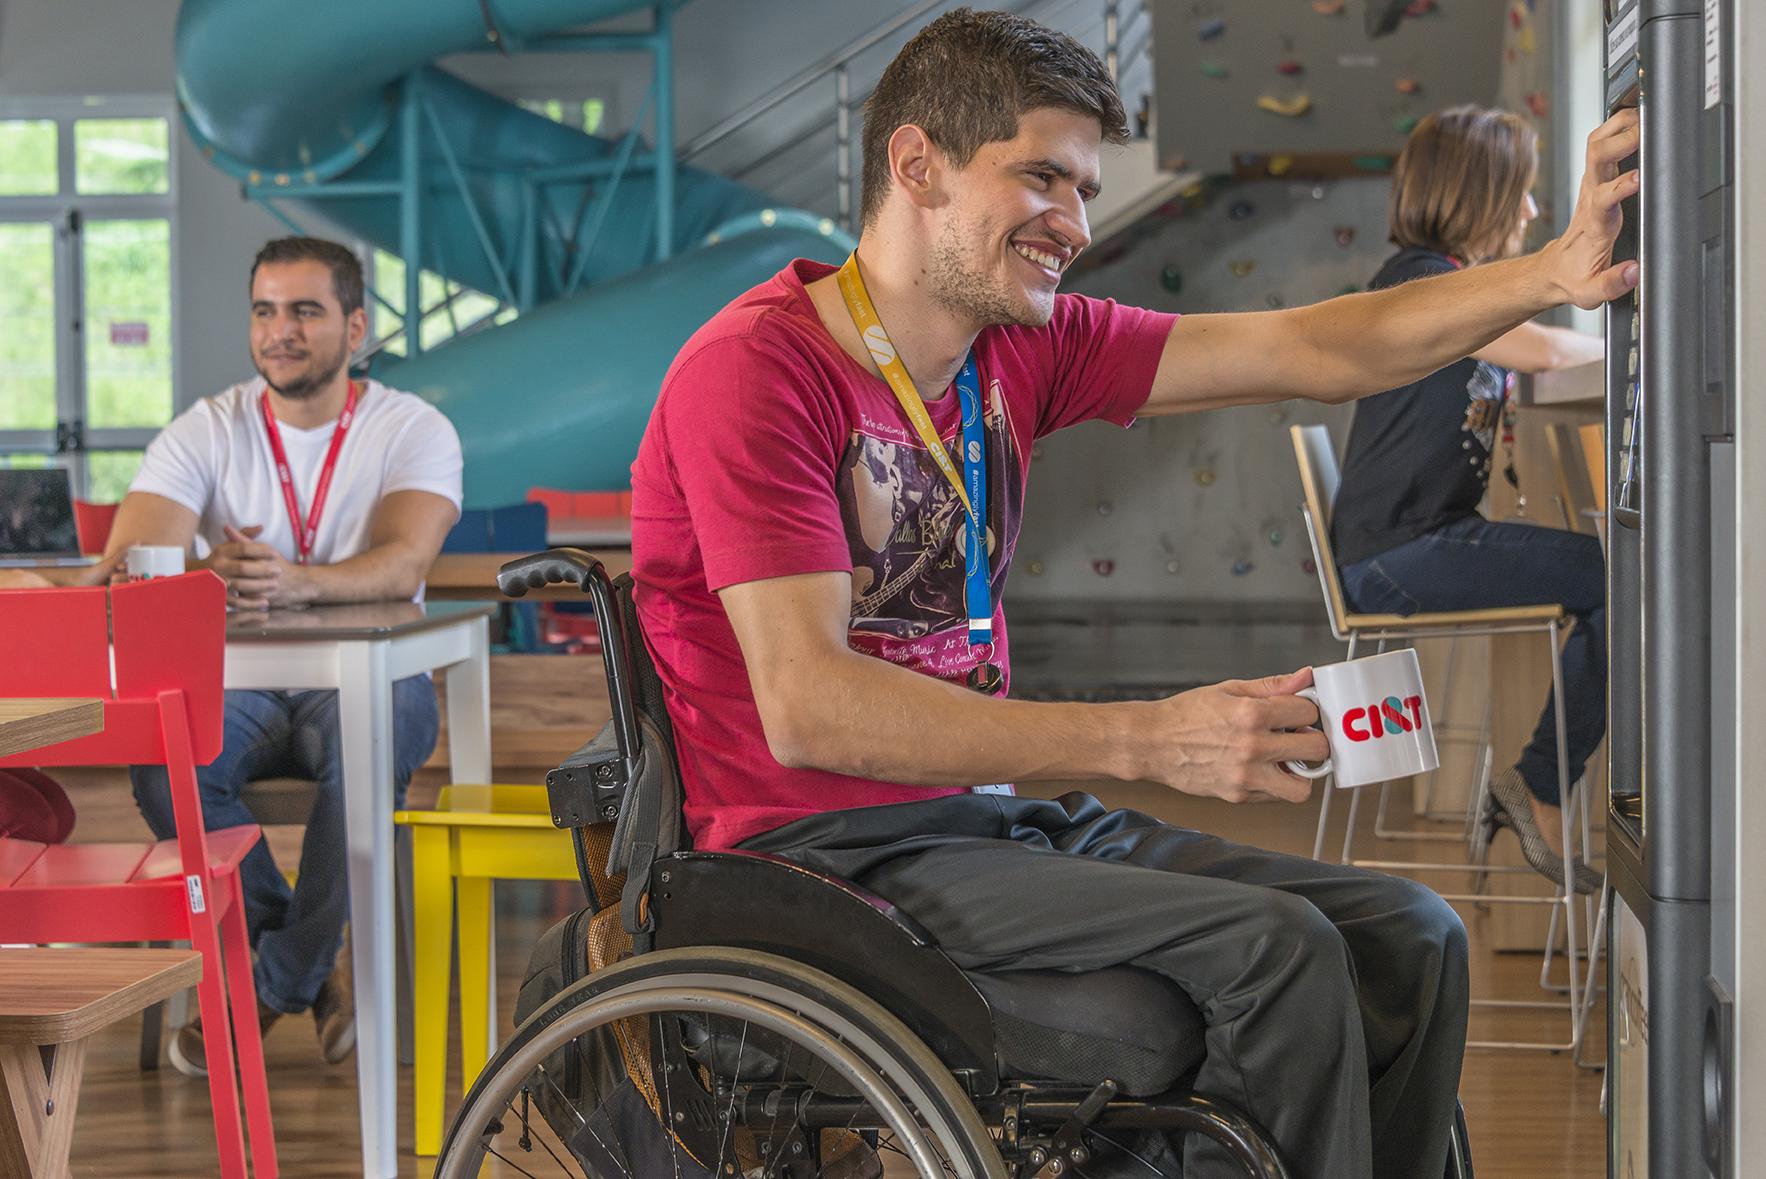 CI&T employee on a wheel chair having a coffee